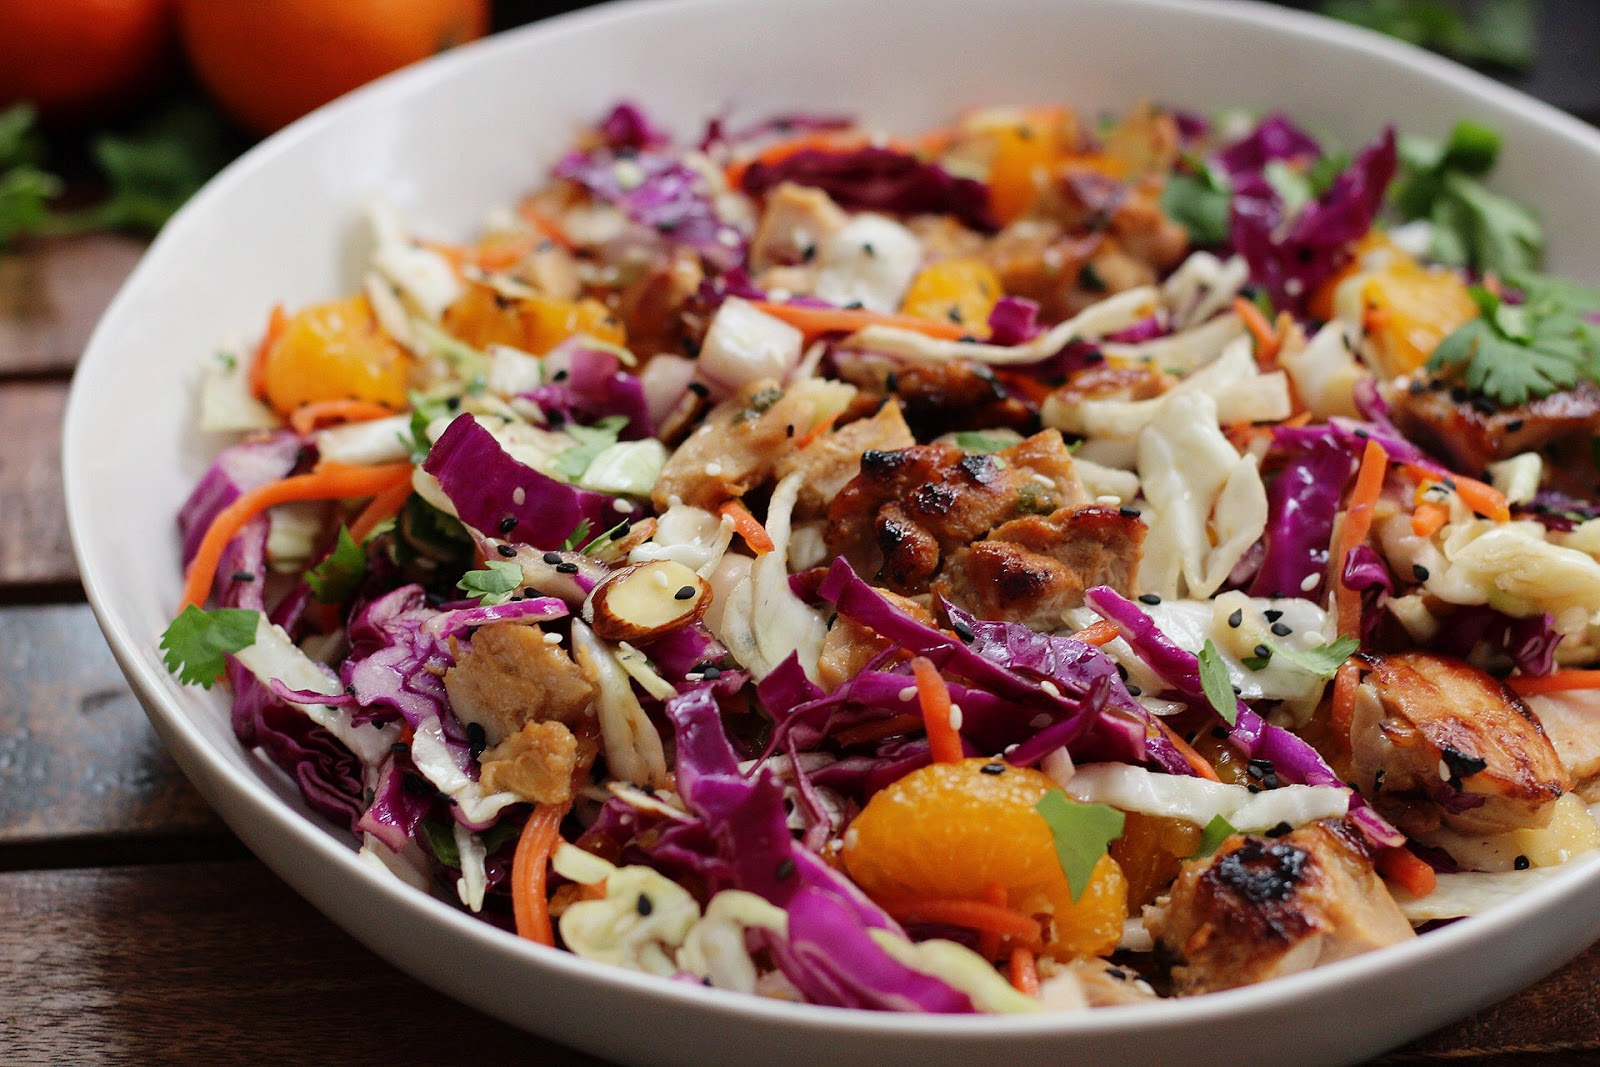 Healthy Sesame Chicken Chopped Salad #salad #diet #keto #easy #lowcarb